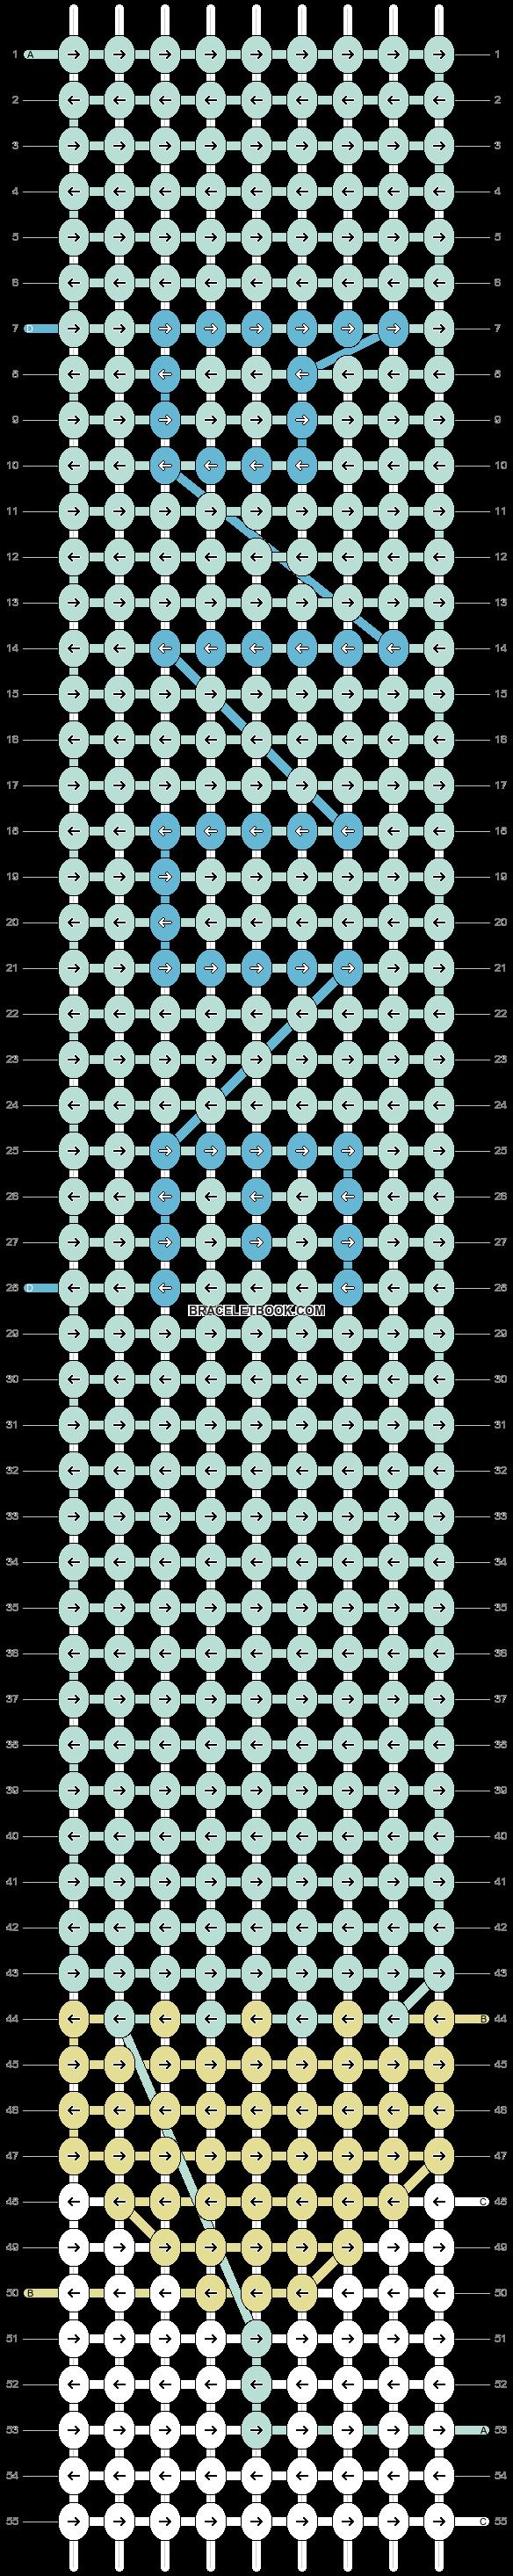 Alpha pattern #20251 pattern